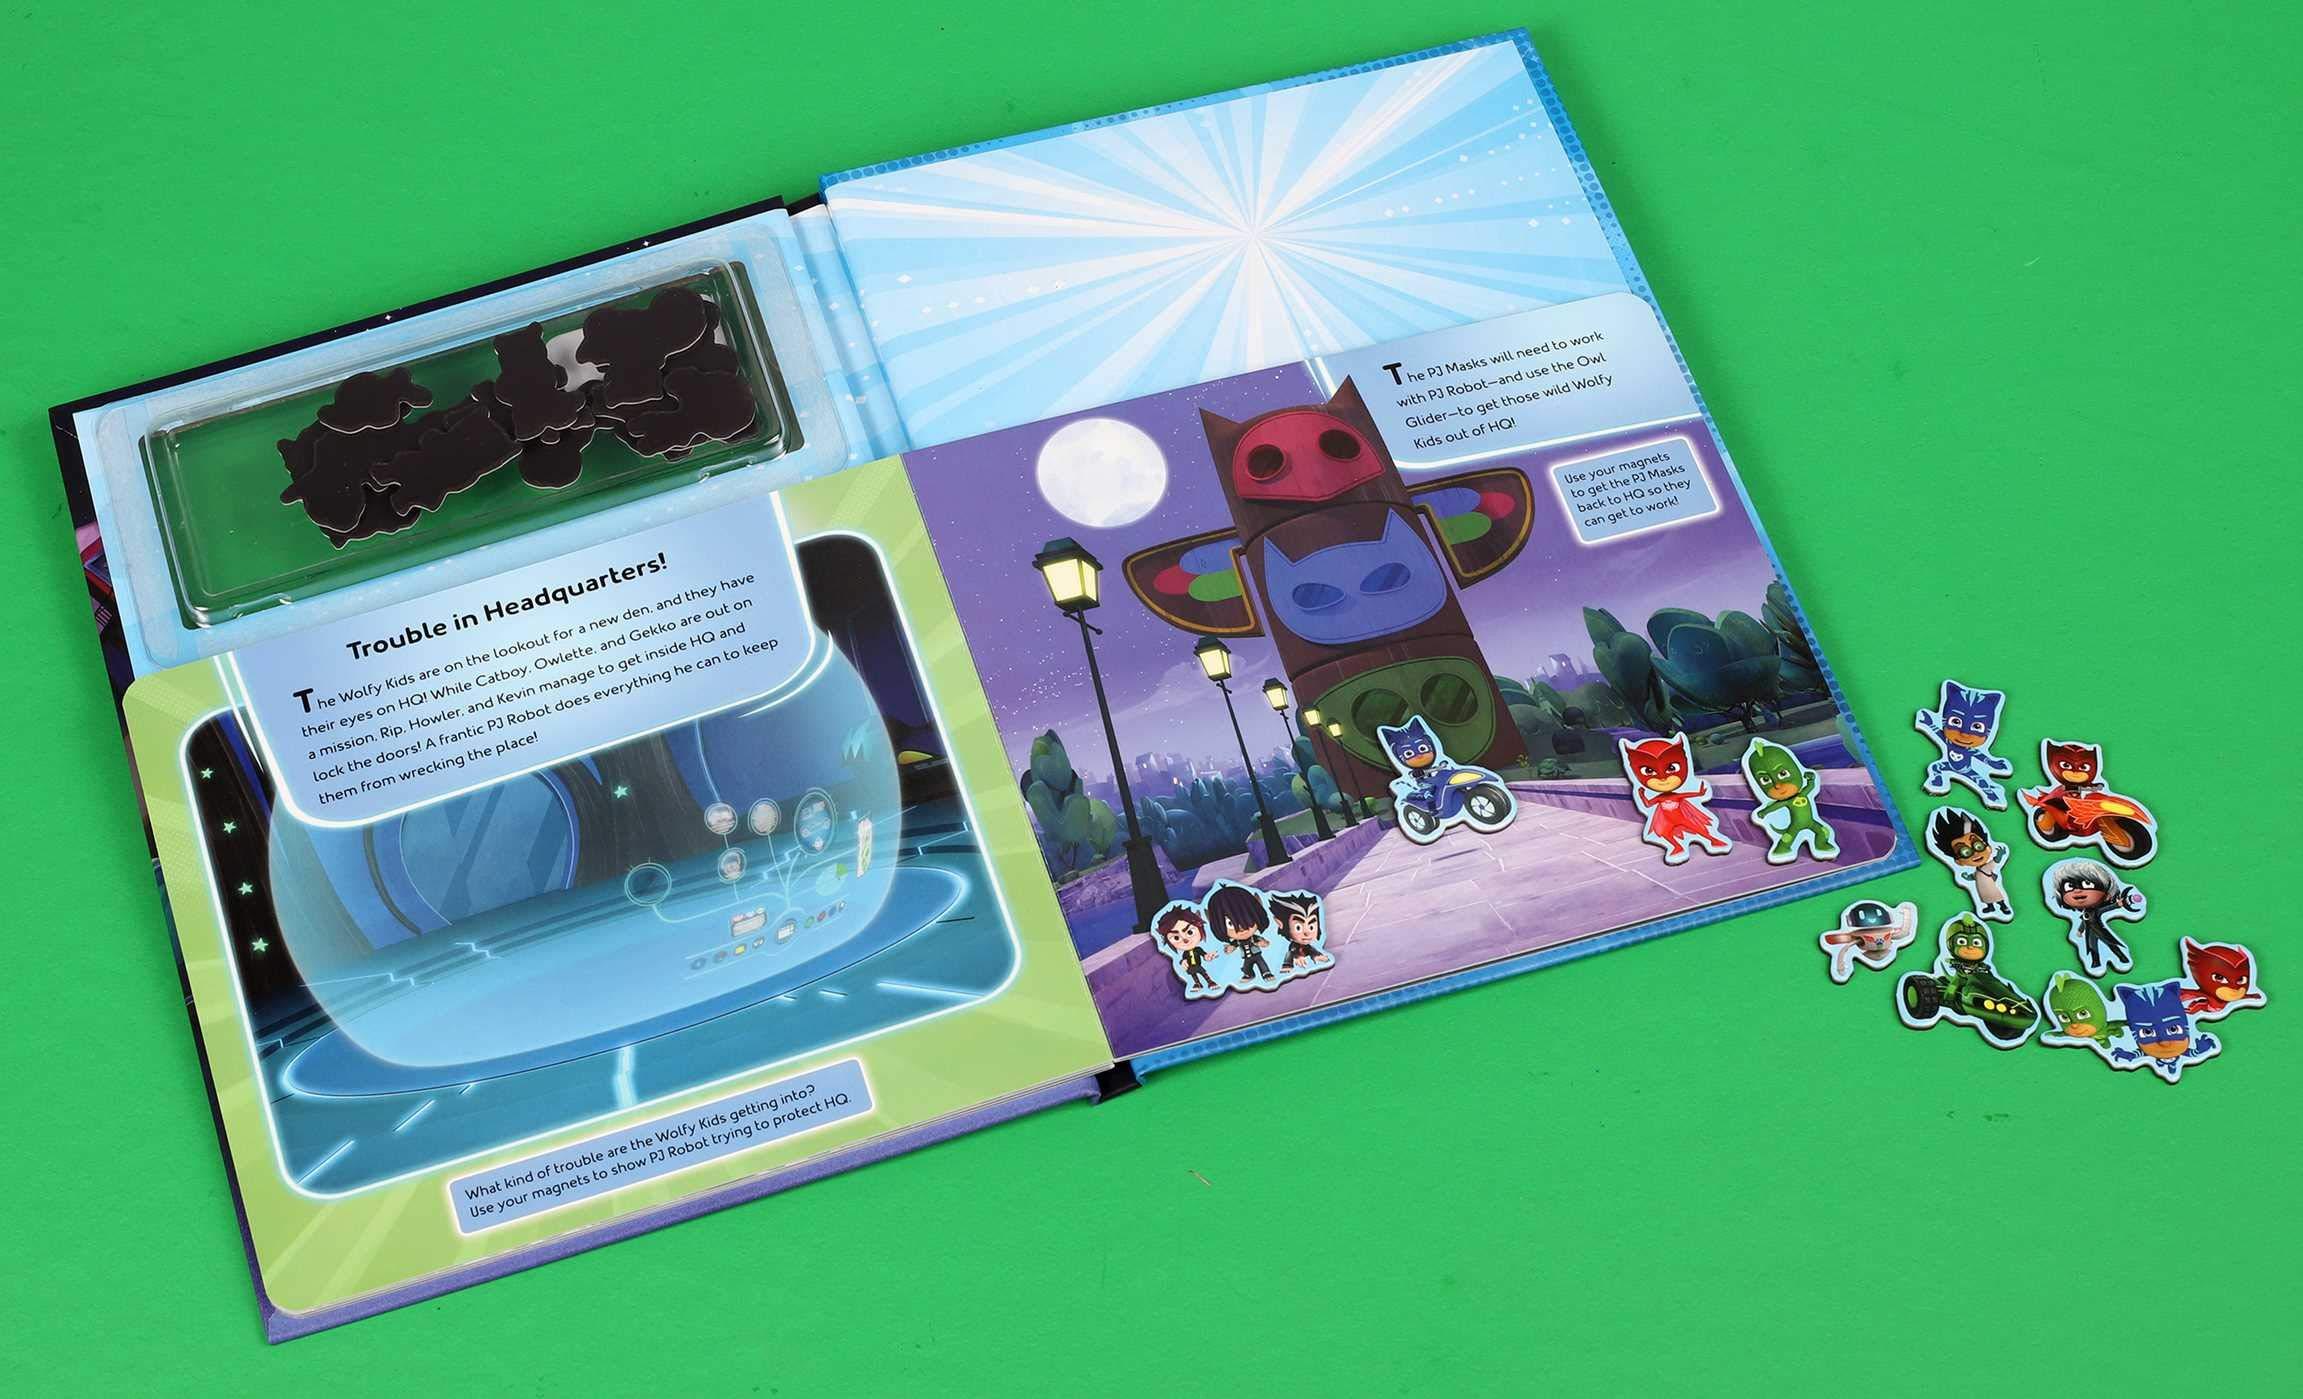 Pj Masks: Here We Go! Magnetic Hardcover: Amazon.es ...